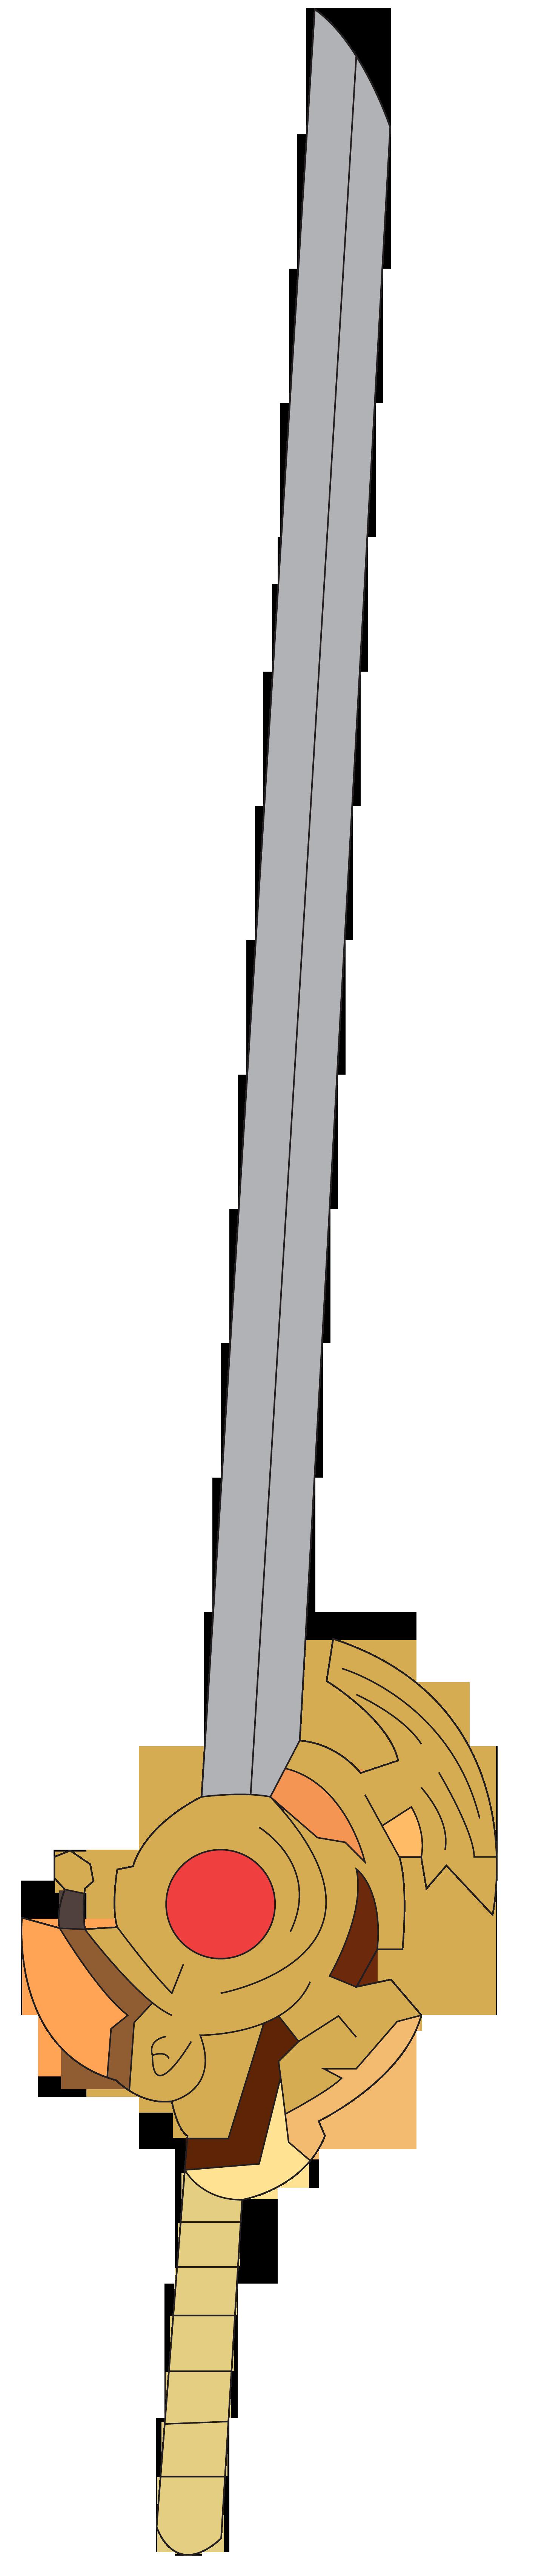 Kamen Rider Barx Sword by SuperHeroTimeFan on DeviantArt